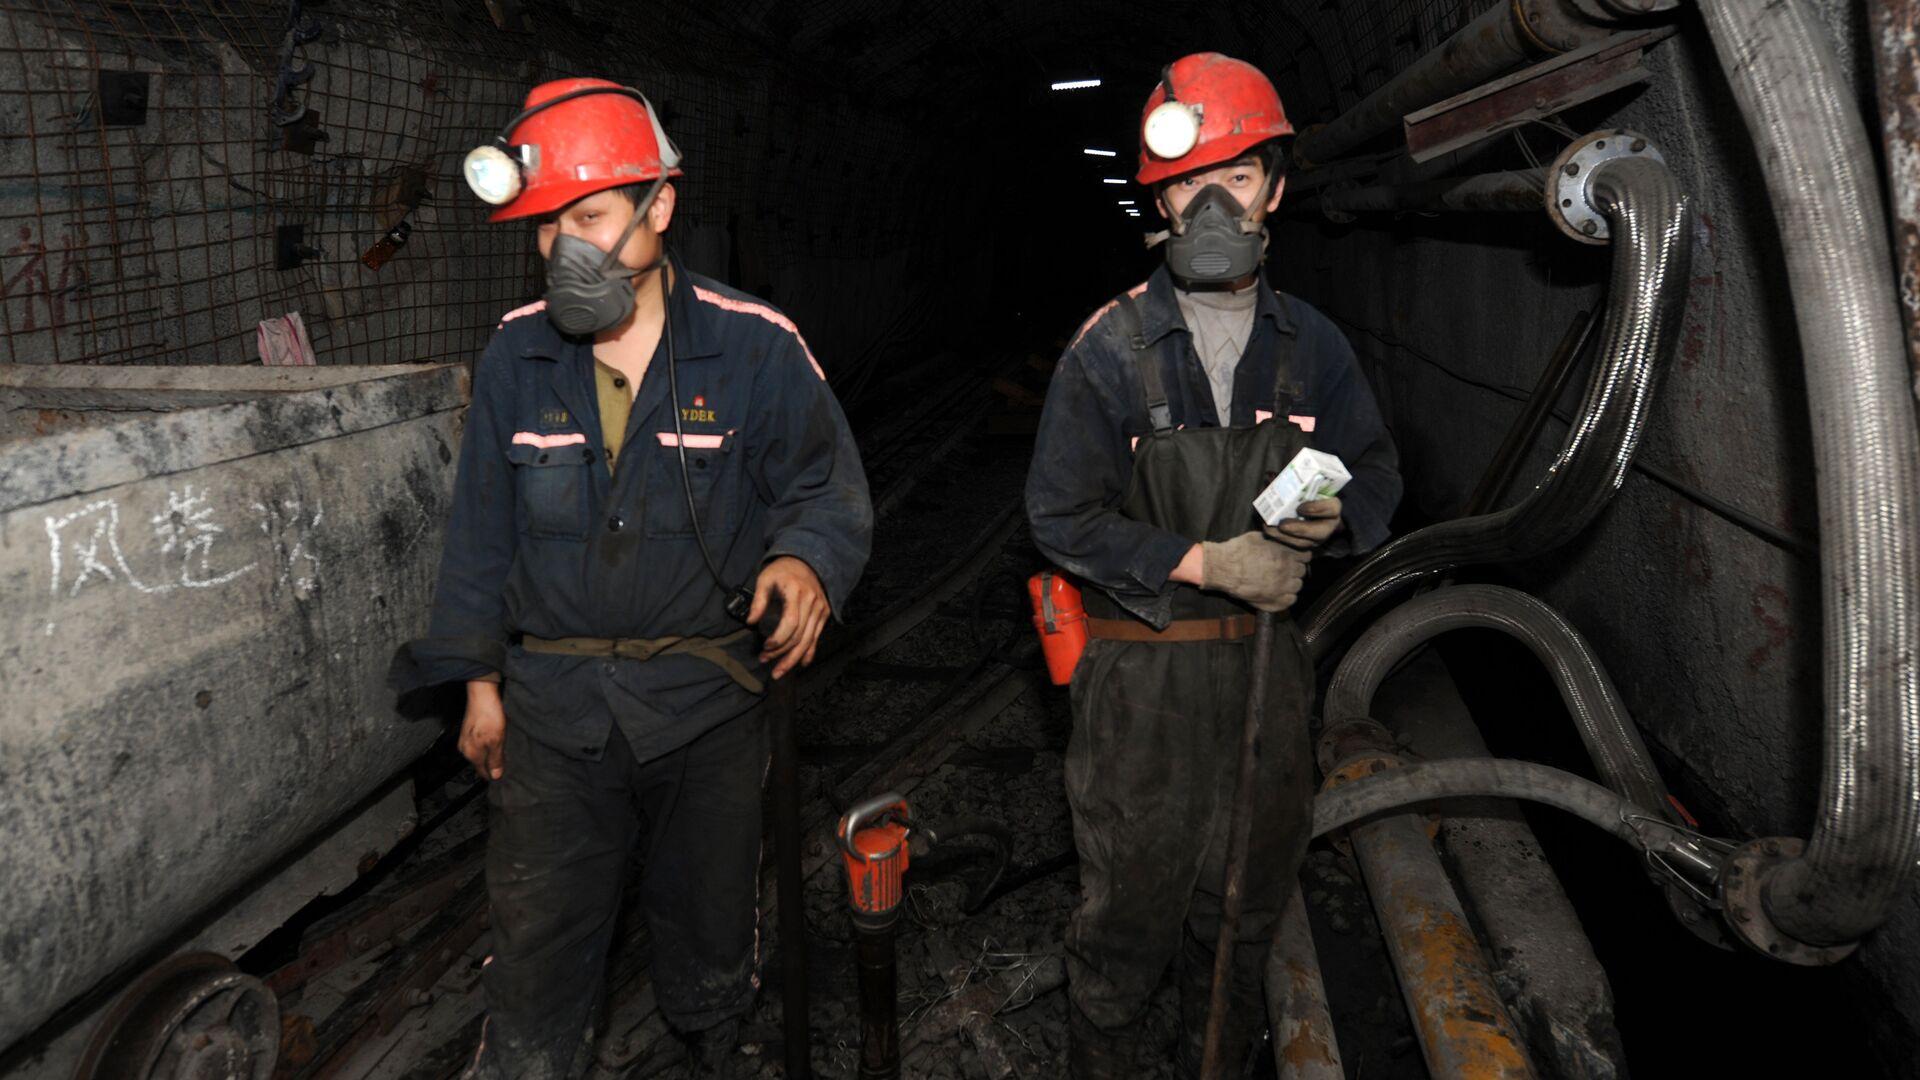 Laborers working at a coal mining facility  - Sputnik International, 1920, 19.08.2021